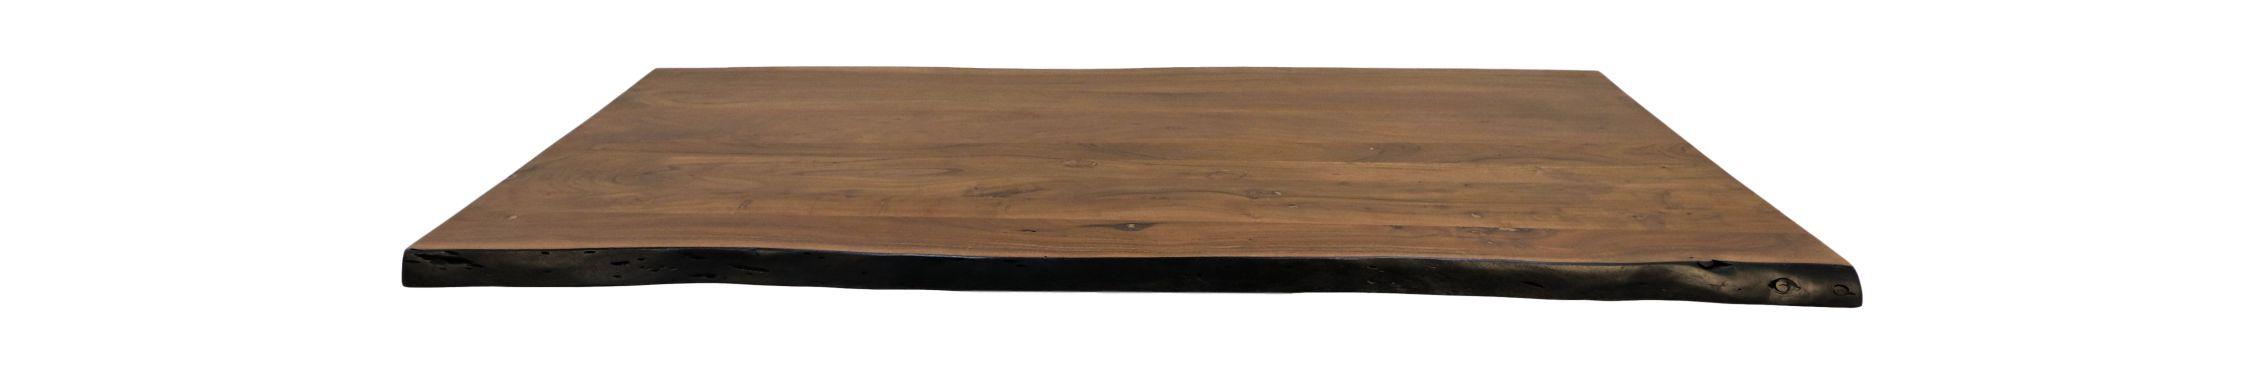 Tafelblad live edge - 220x100x5 - Walnoot bruin - Acaciahout